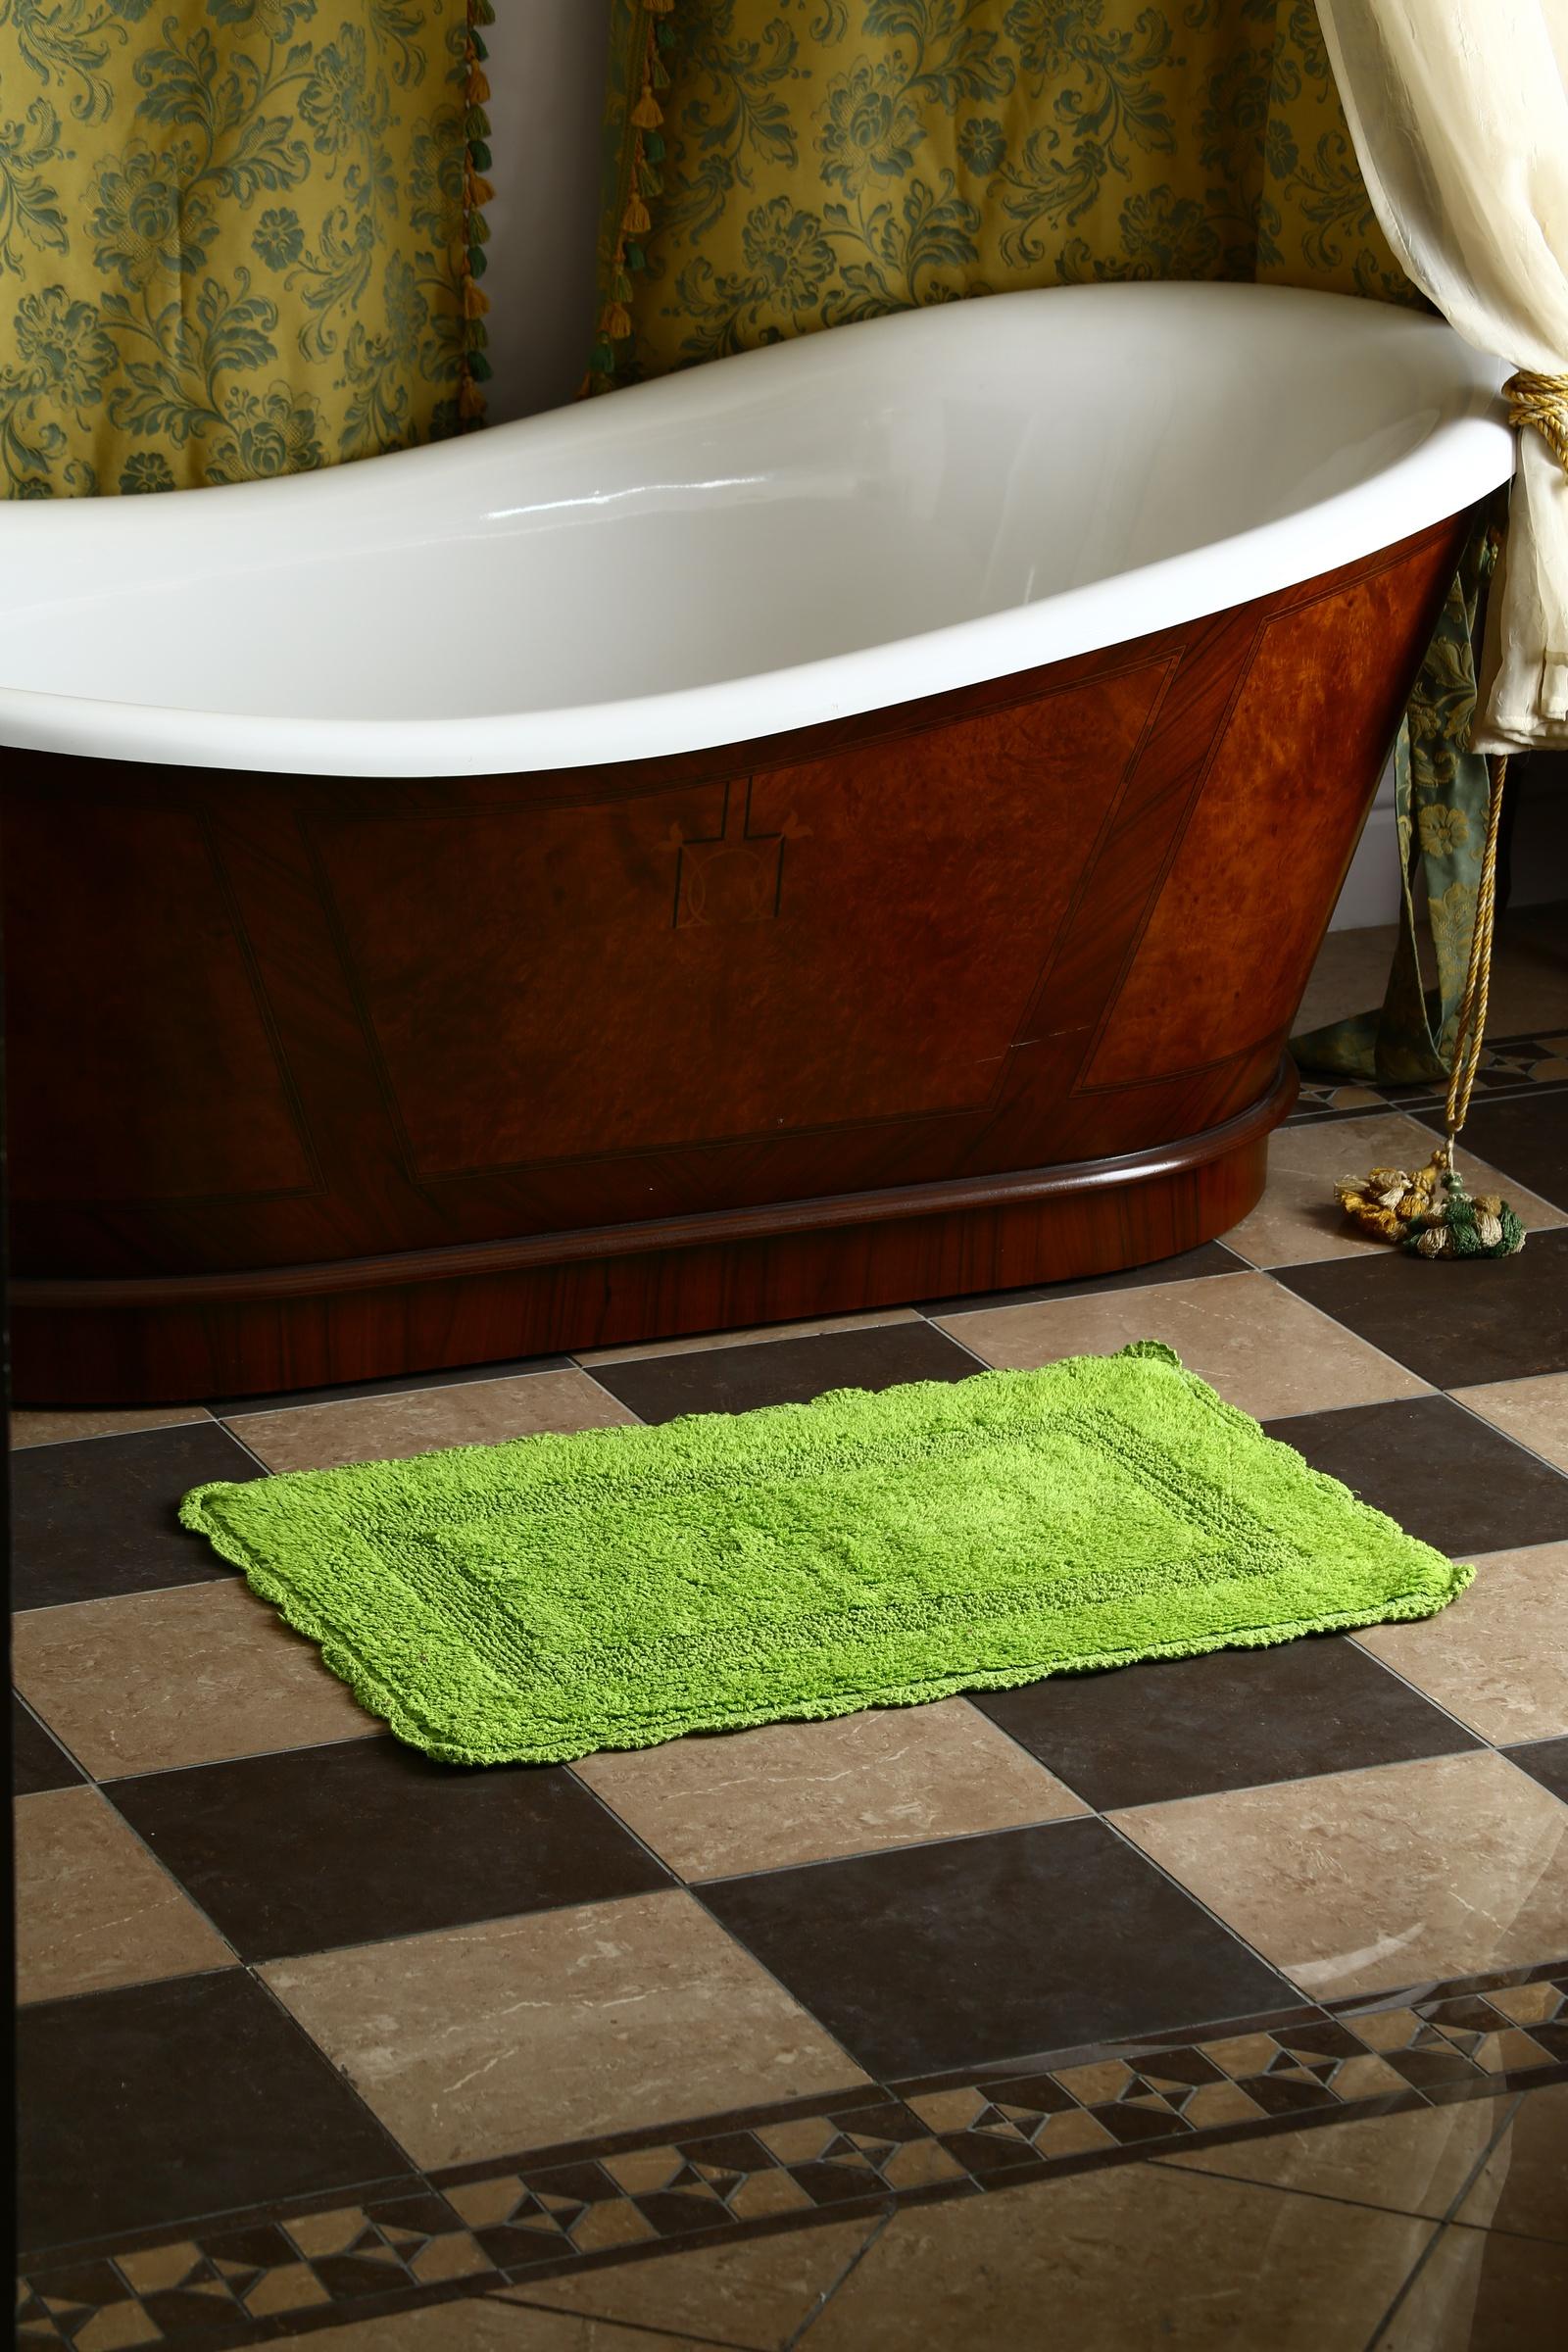 Фото - Коврик Arloni Лейс, 1215, с кружевом, 50 х 80 см, лайм arloni коврик самотканный для ванной